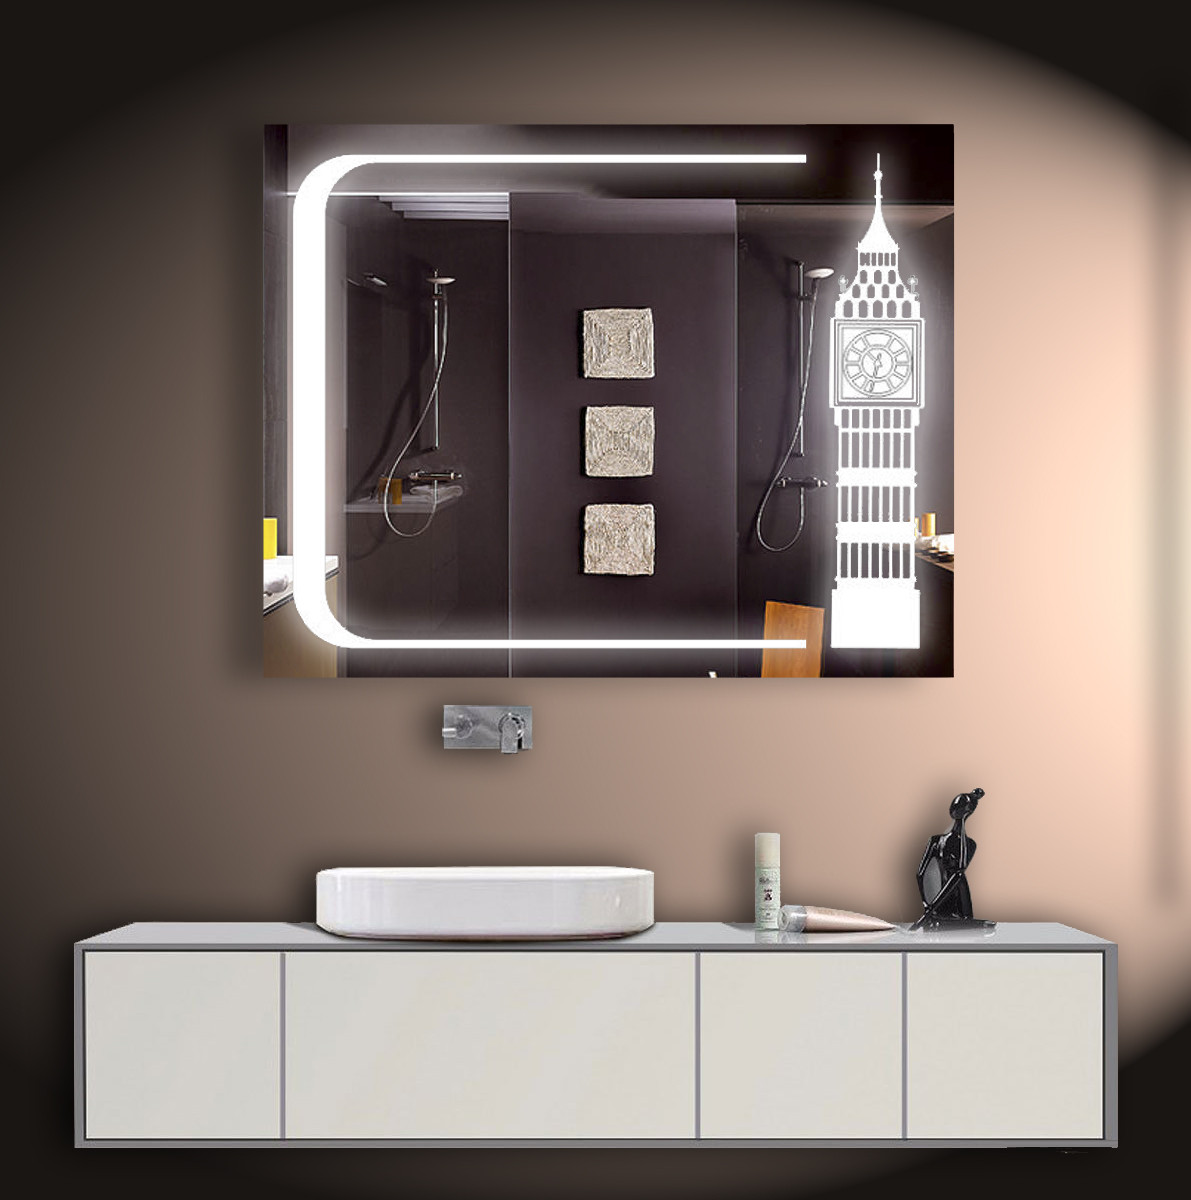 Зеркало LED со светодиодной подсветкой ver-3095 1000х800 мм